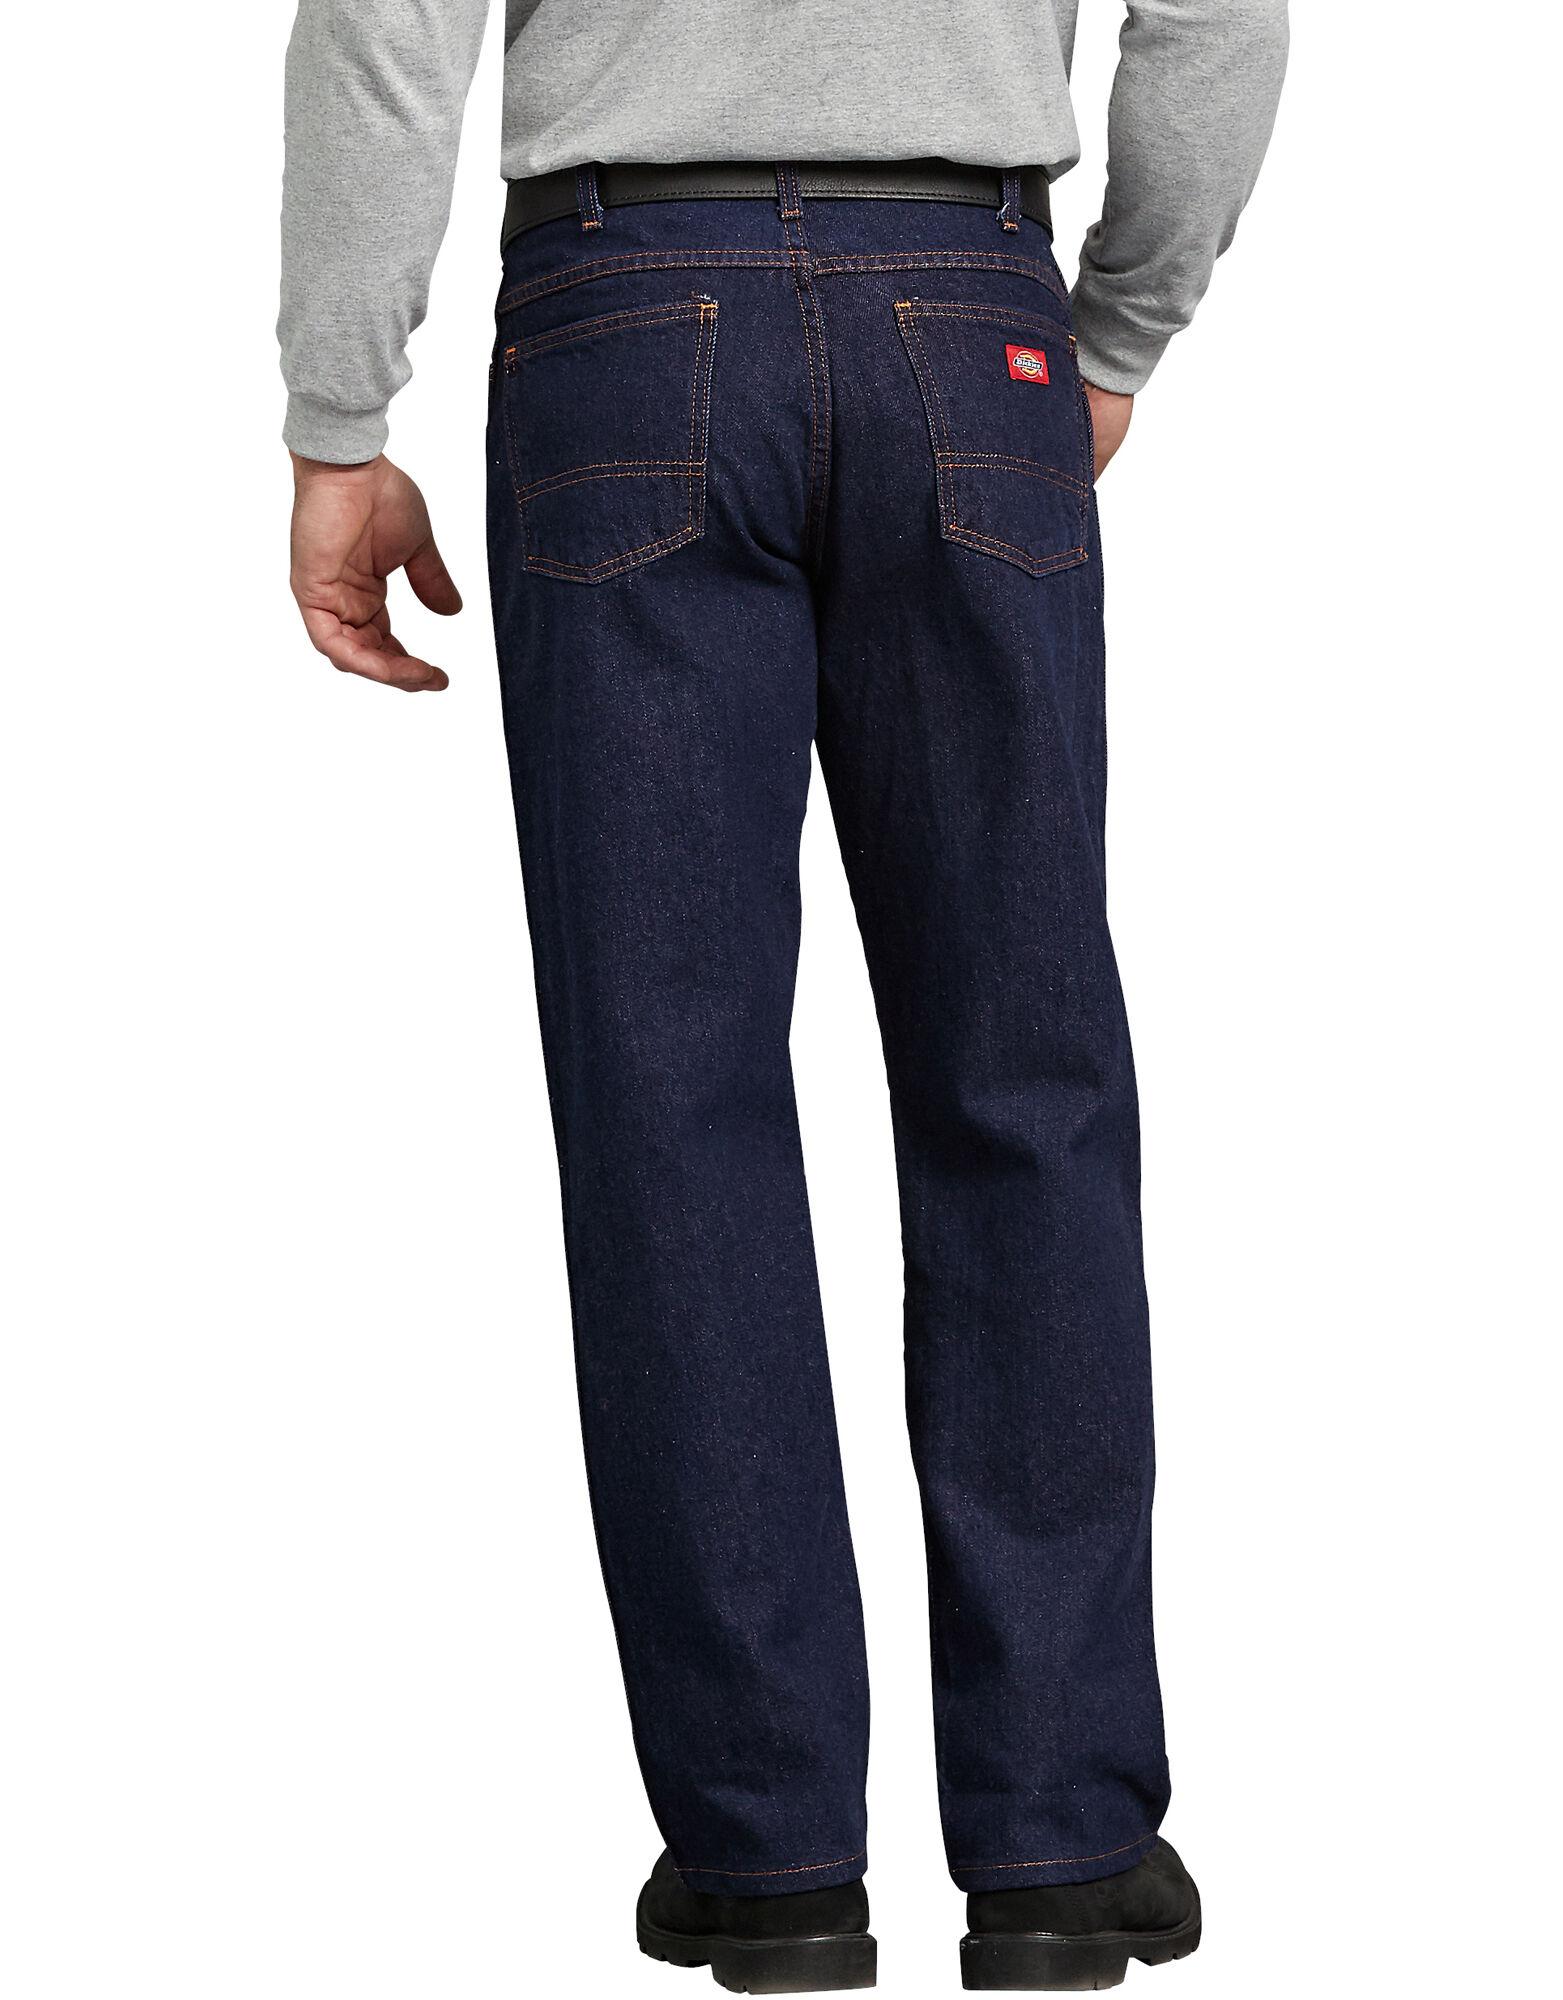 Regular Fit Jean For Men Rinsed Indigo Blue Size 31 32 Dickies